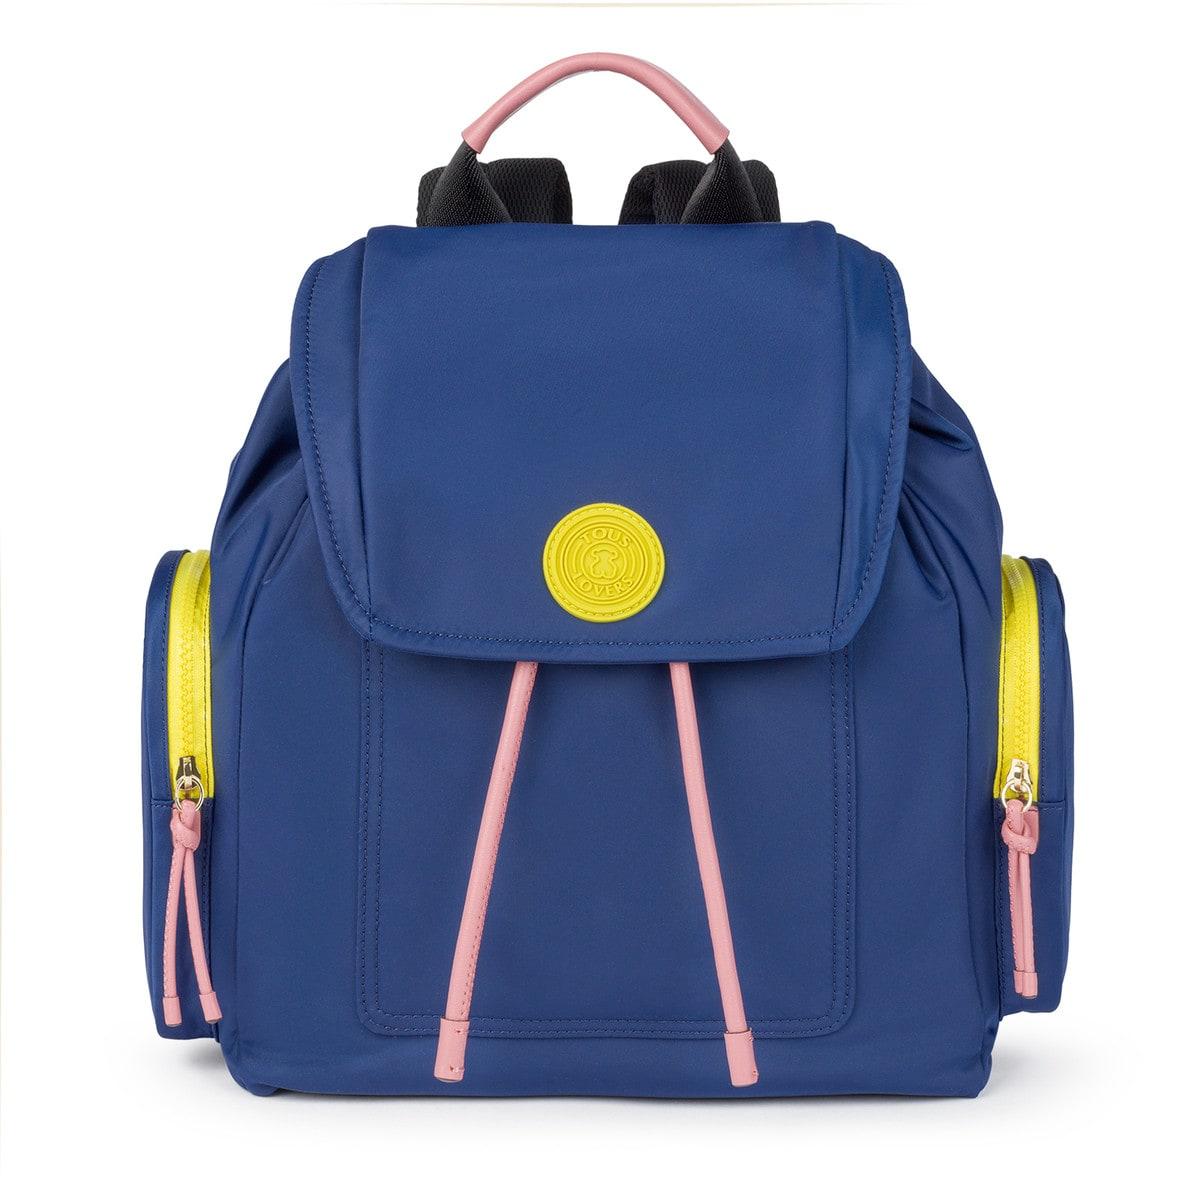 c9271c6f2 Medium tri-navy colored Doromy pocket Backpack - Tous Site GB